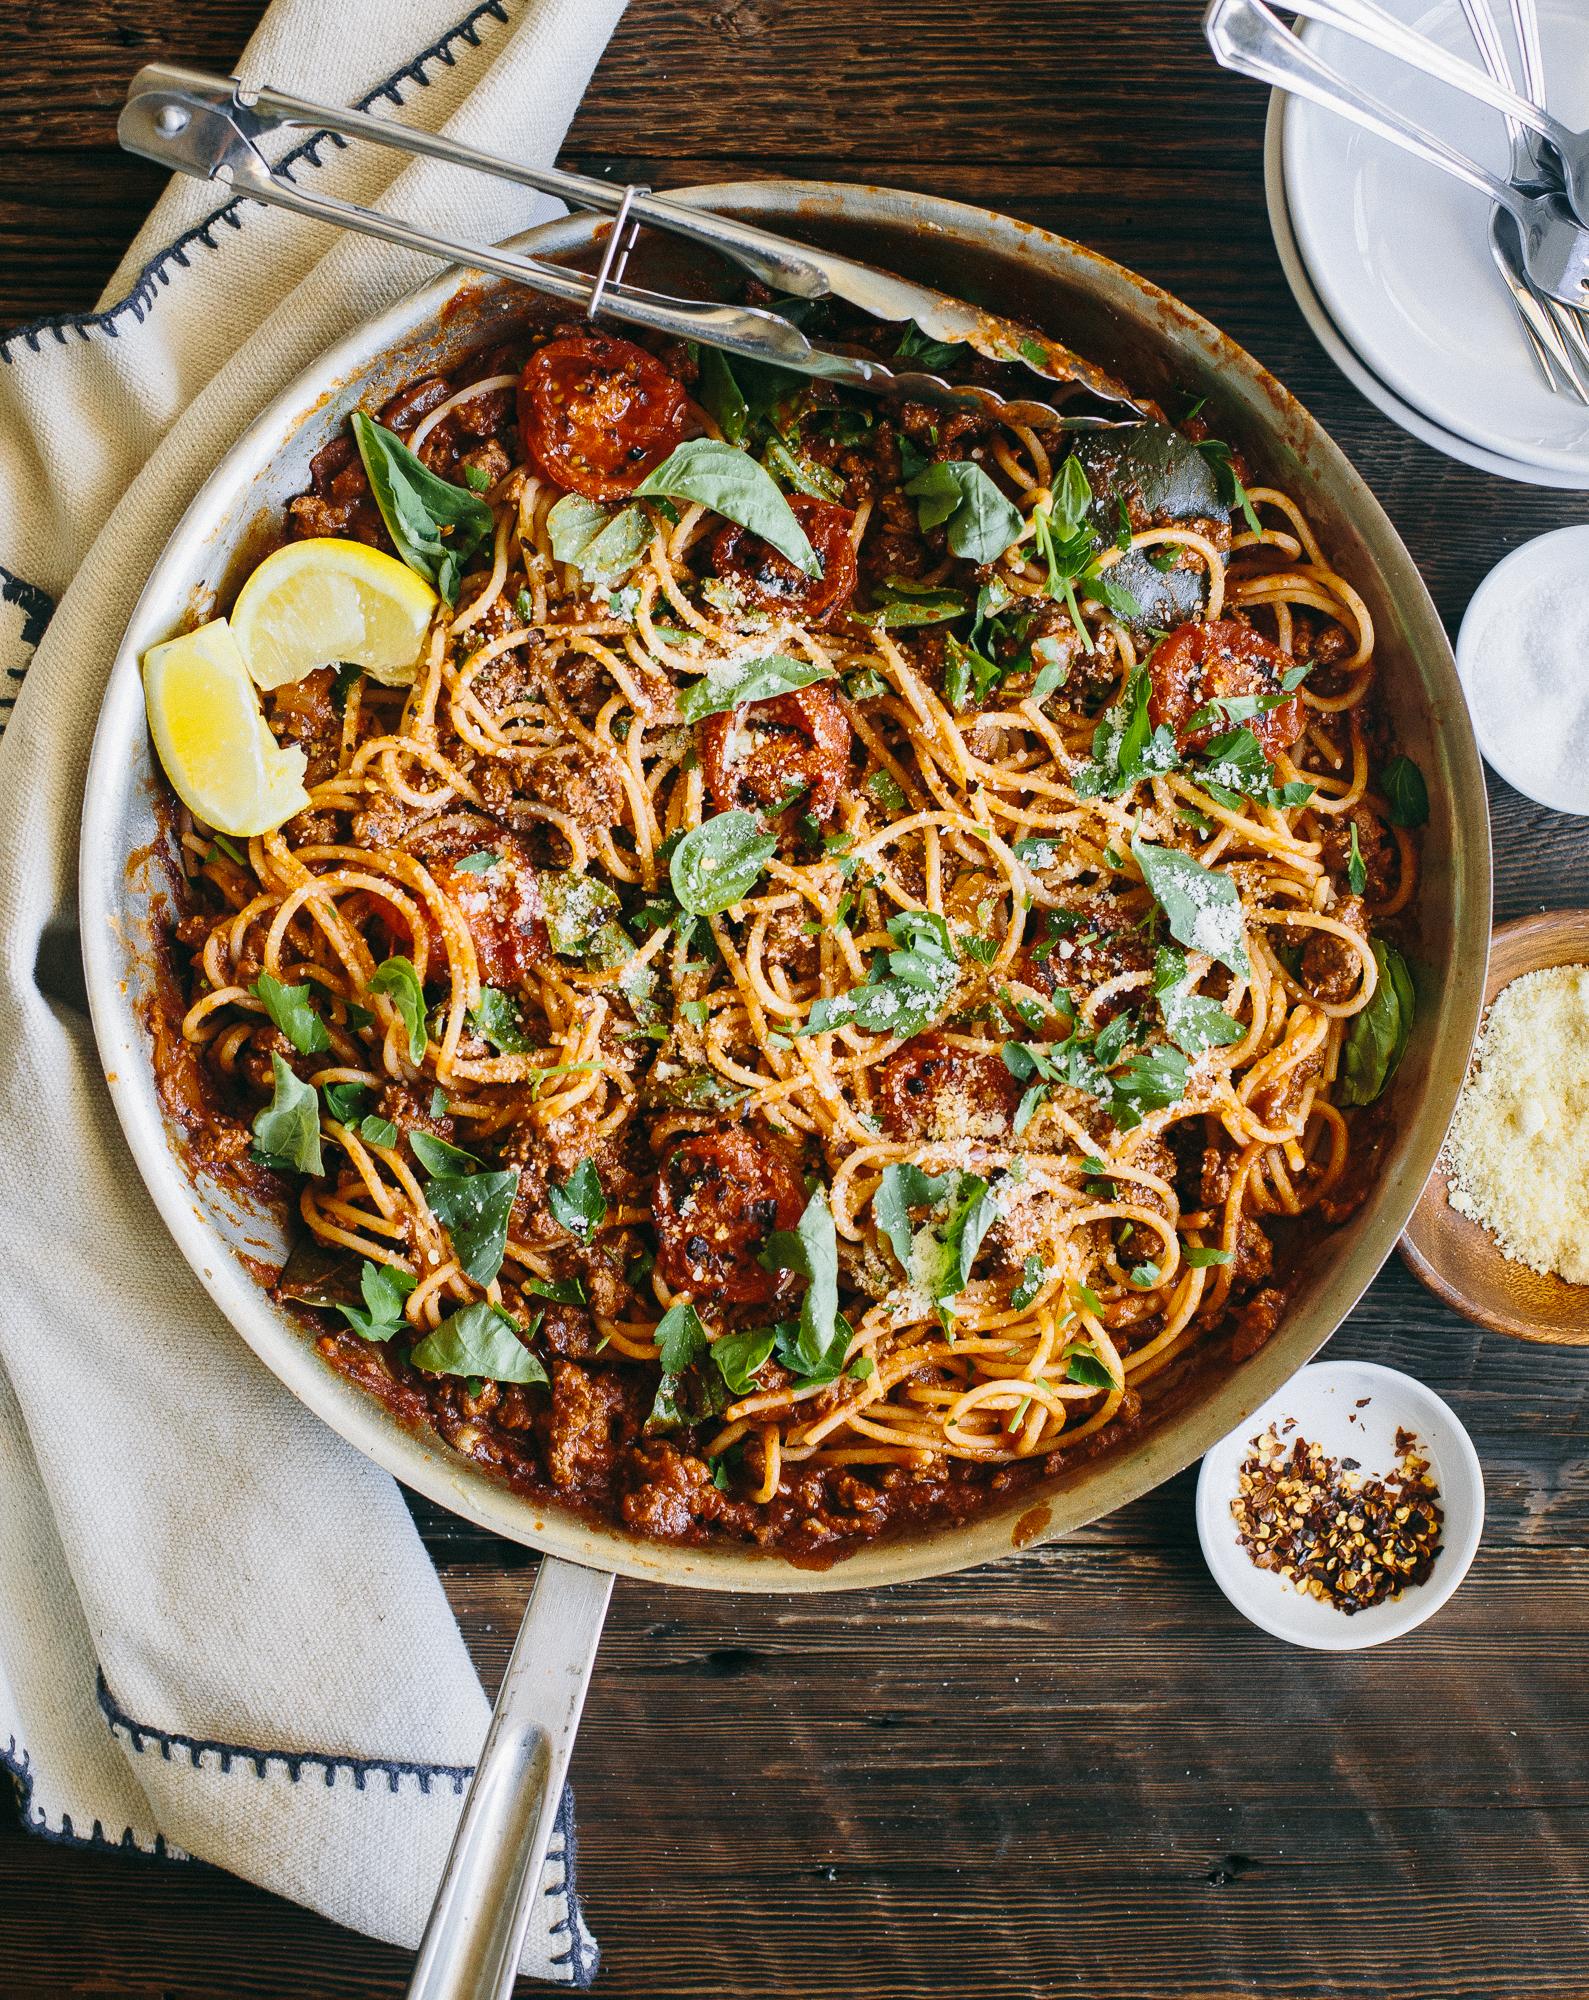 Recipe for gluten free pasta noodles